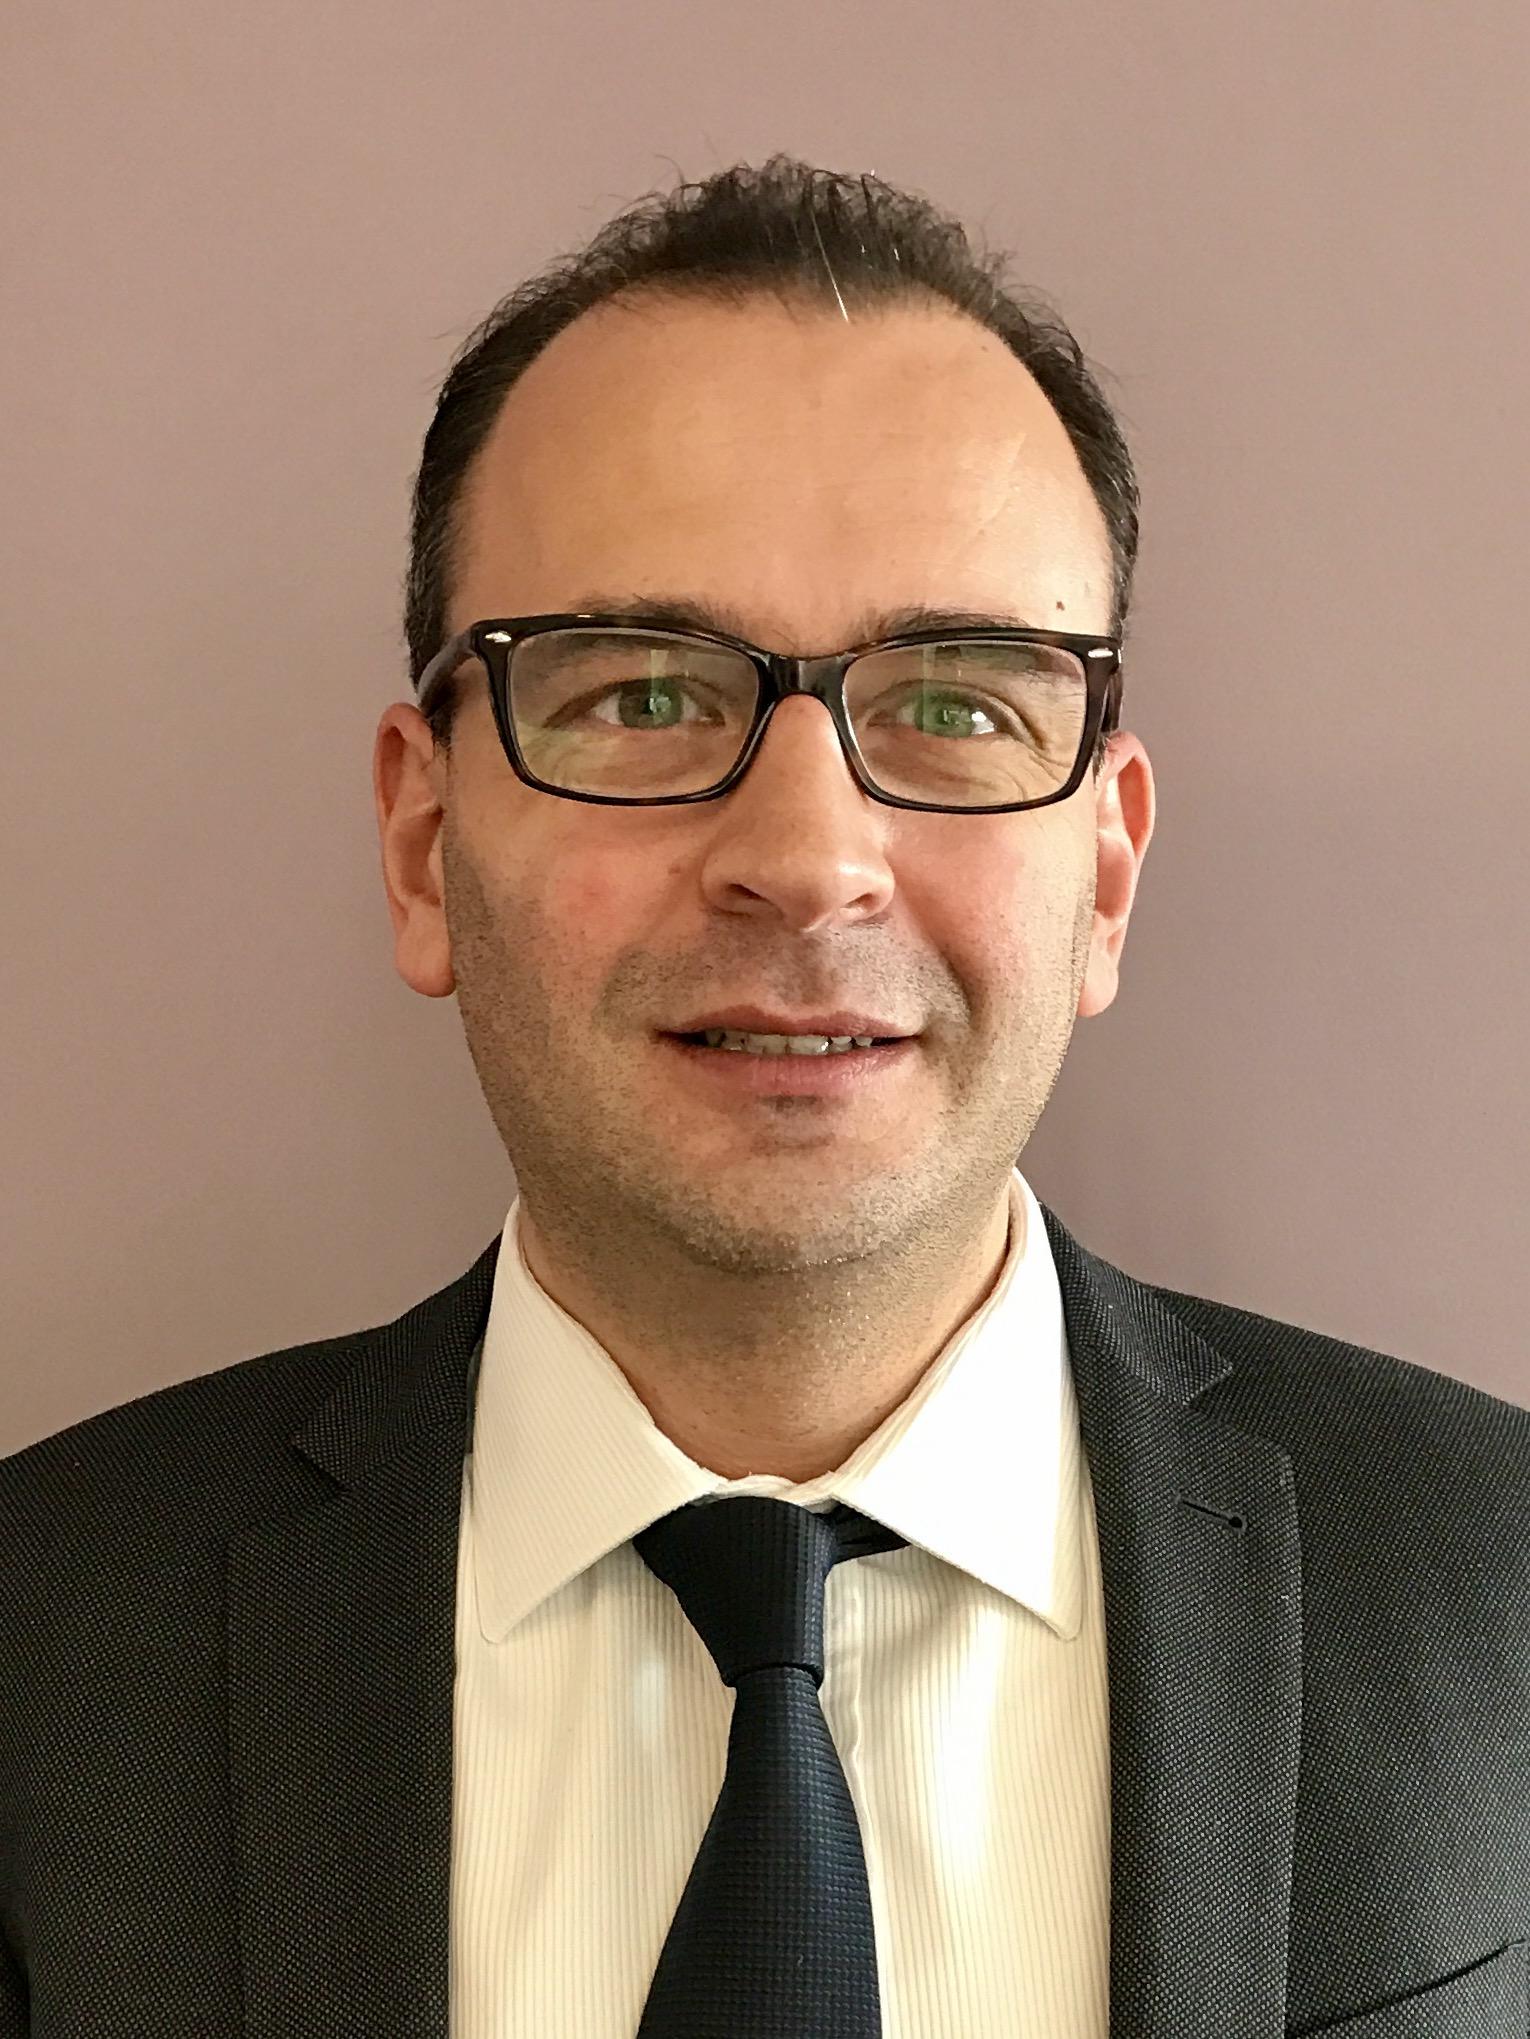 RICCARDO CECI - Unione Bancaria e Basilea 3 - Risk & Supervision